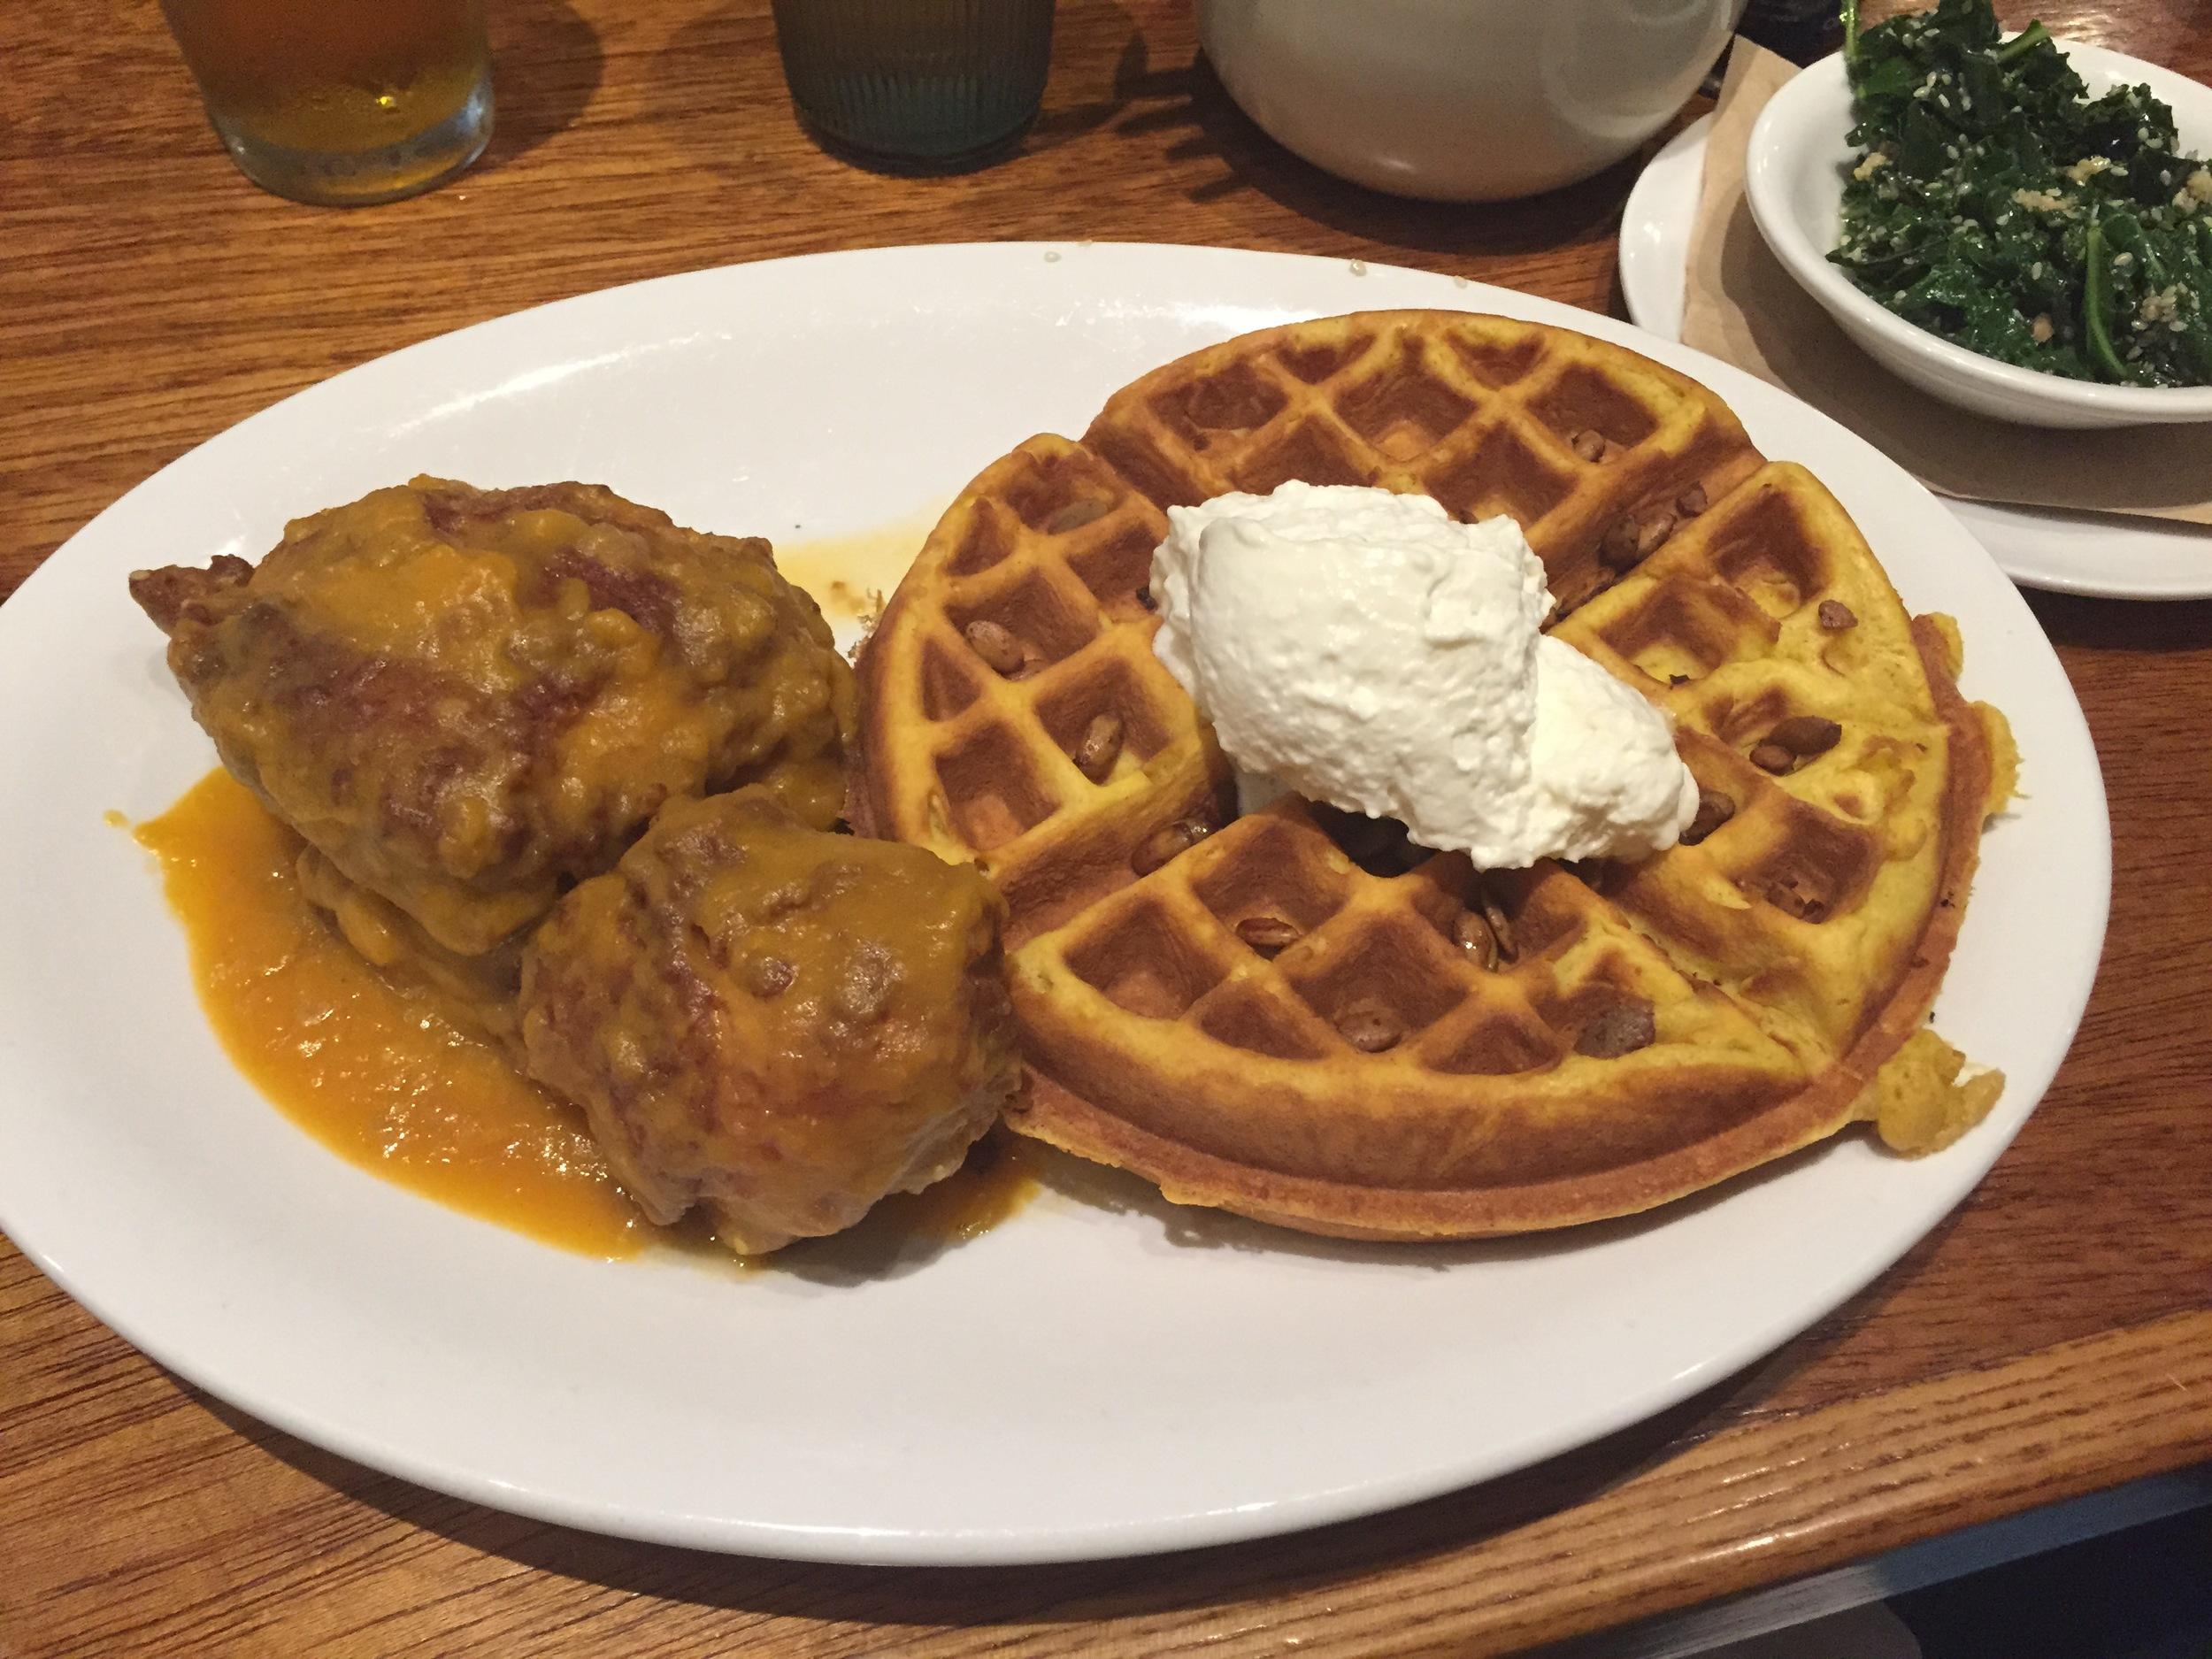 Korean Fried Chicken/Pumpkin Waffle/Whipped Cream